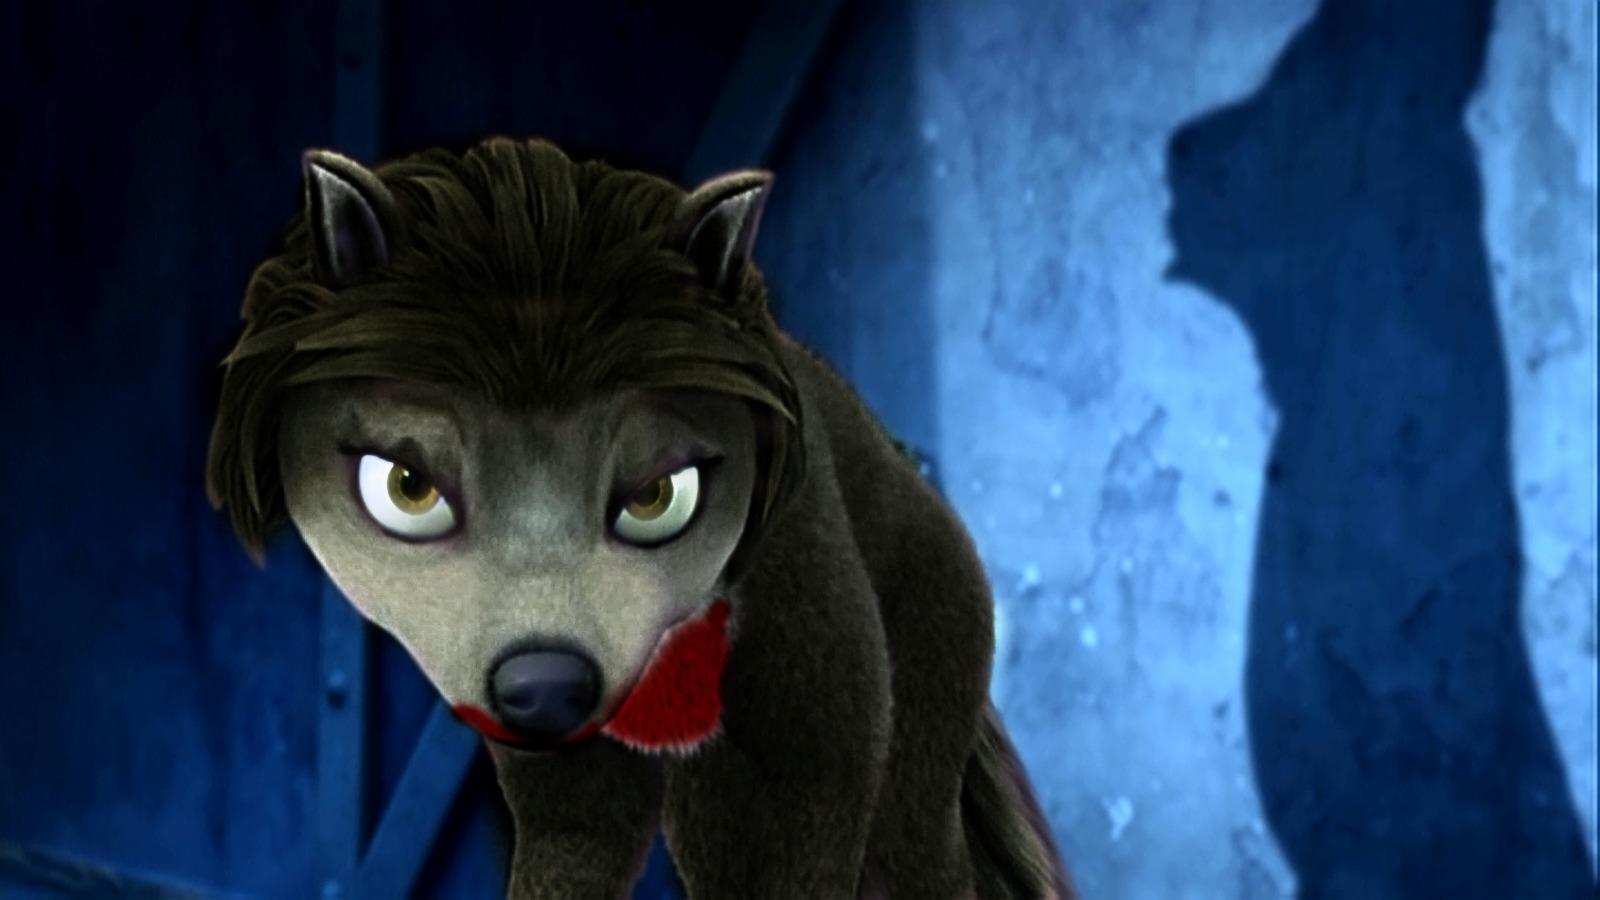 qq可怕狼头像